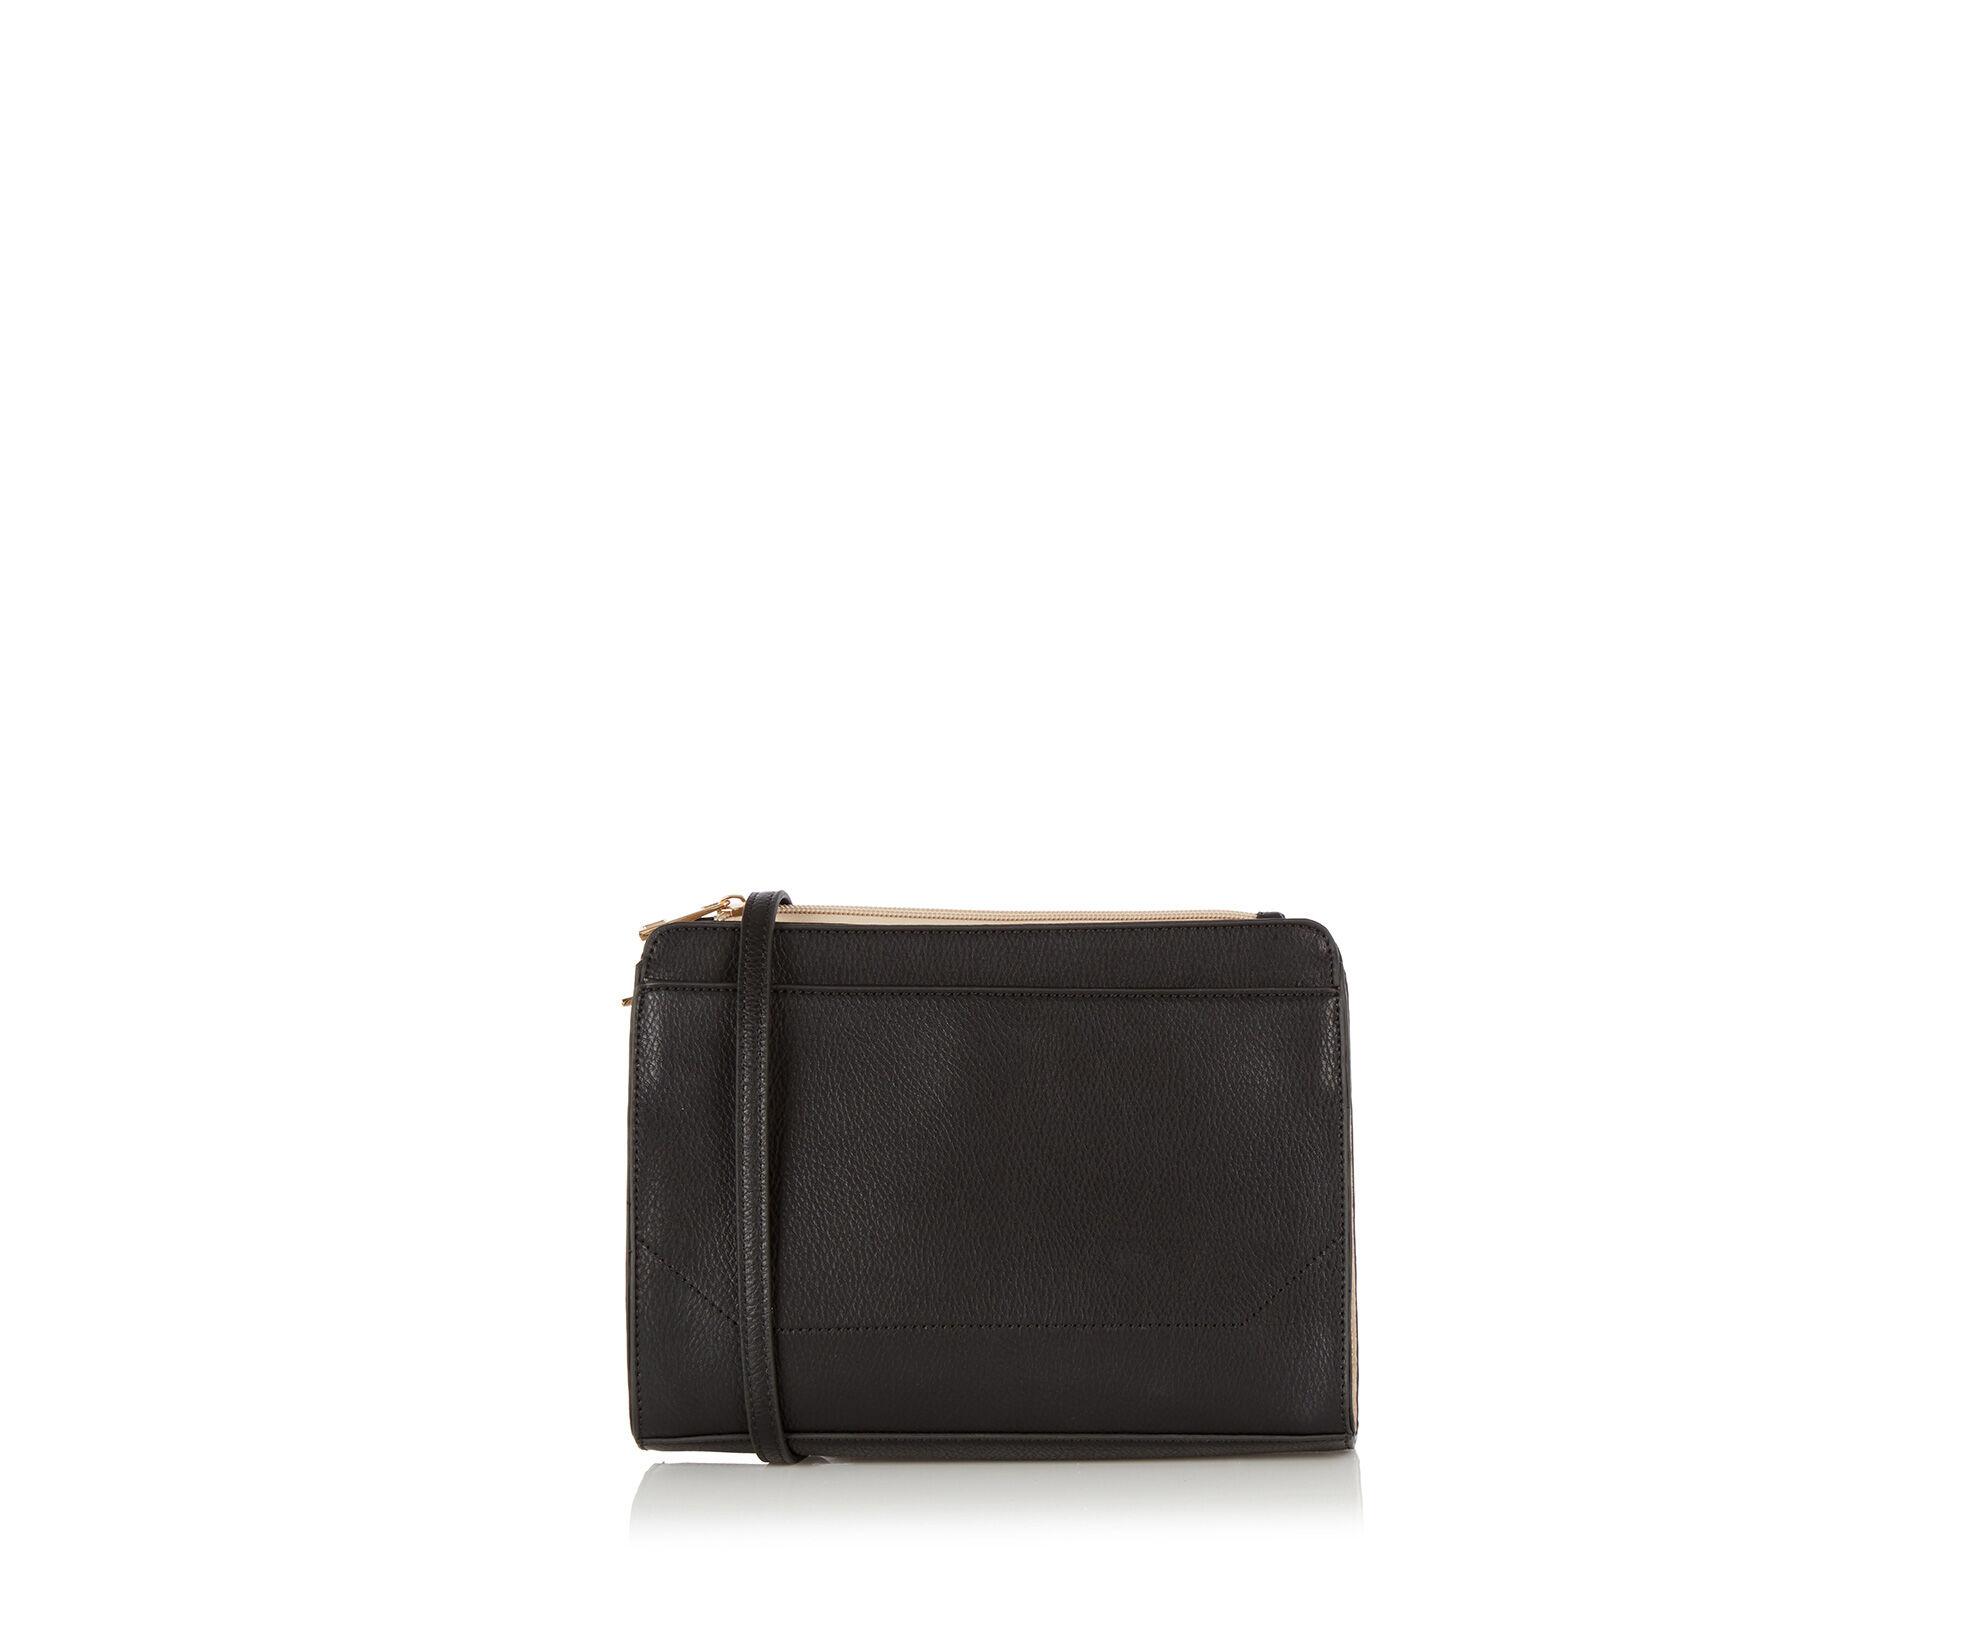 Oasis, Kimmy Cross-Body Bag Multi Black 0